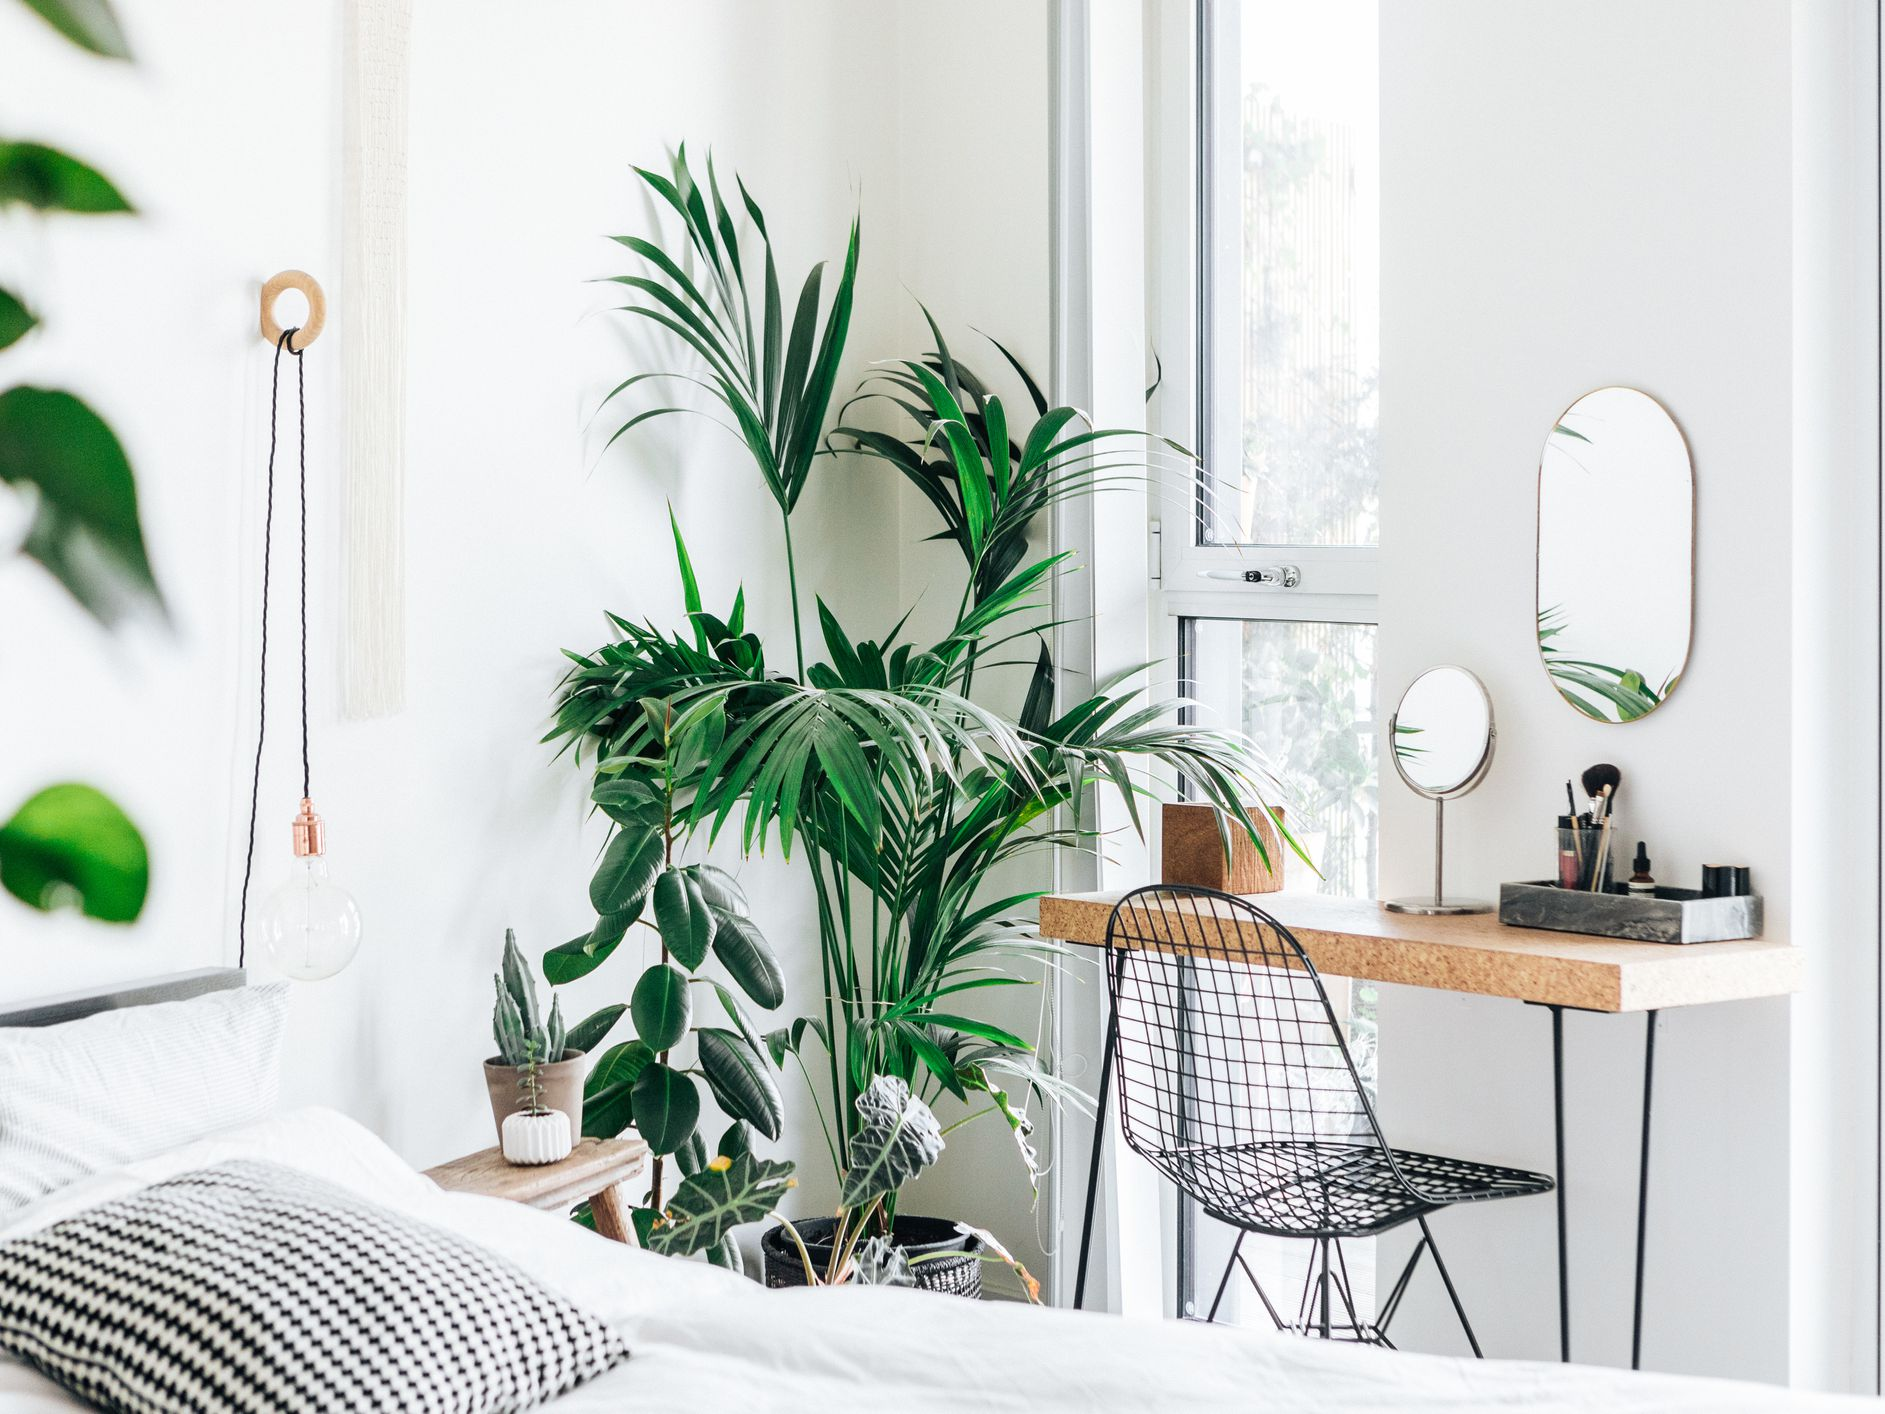 Top 32 Interior Design Instagram Accounts